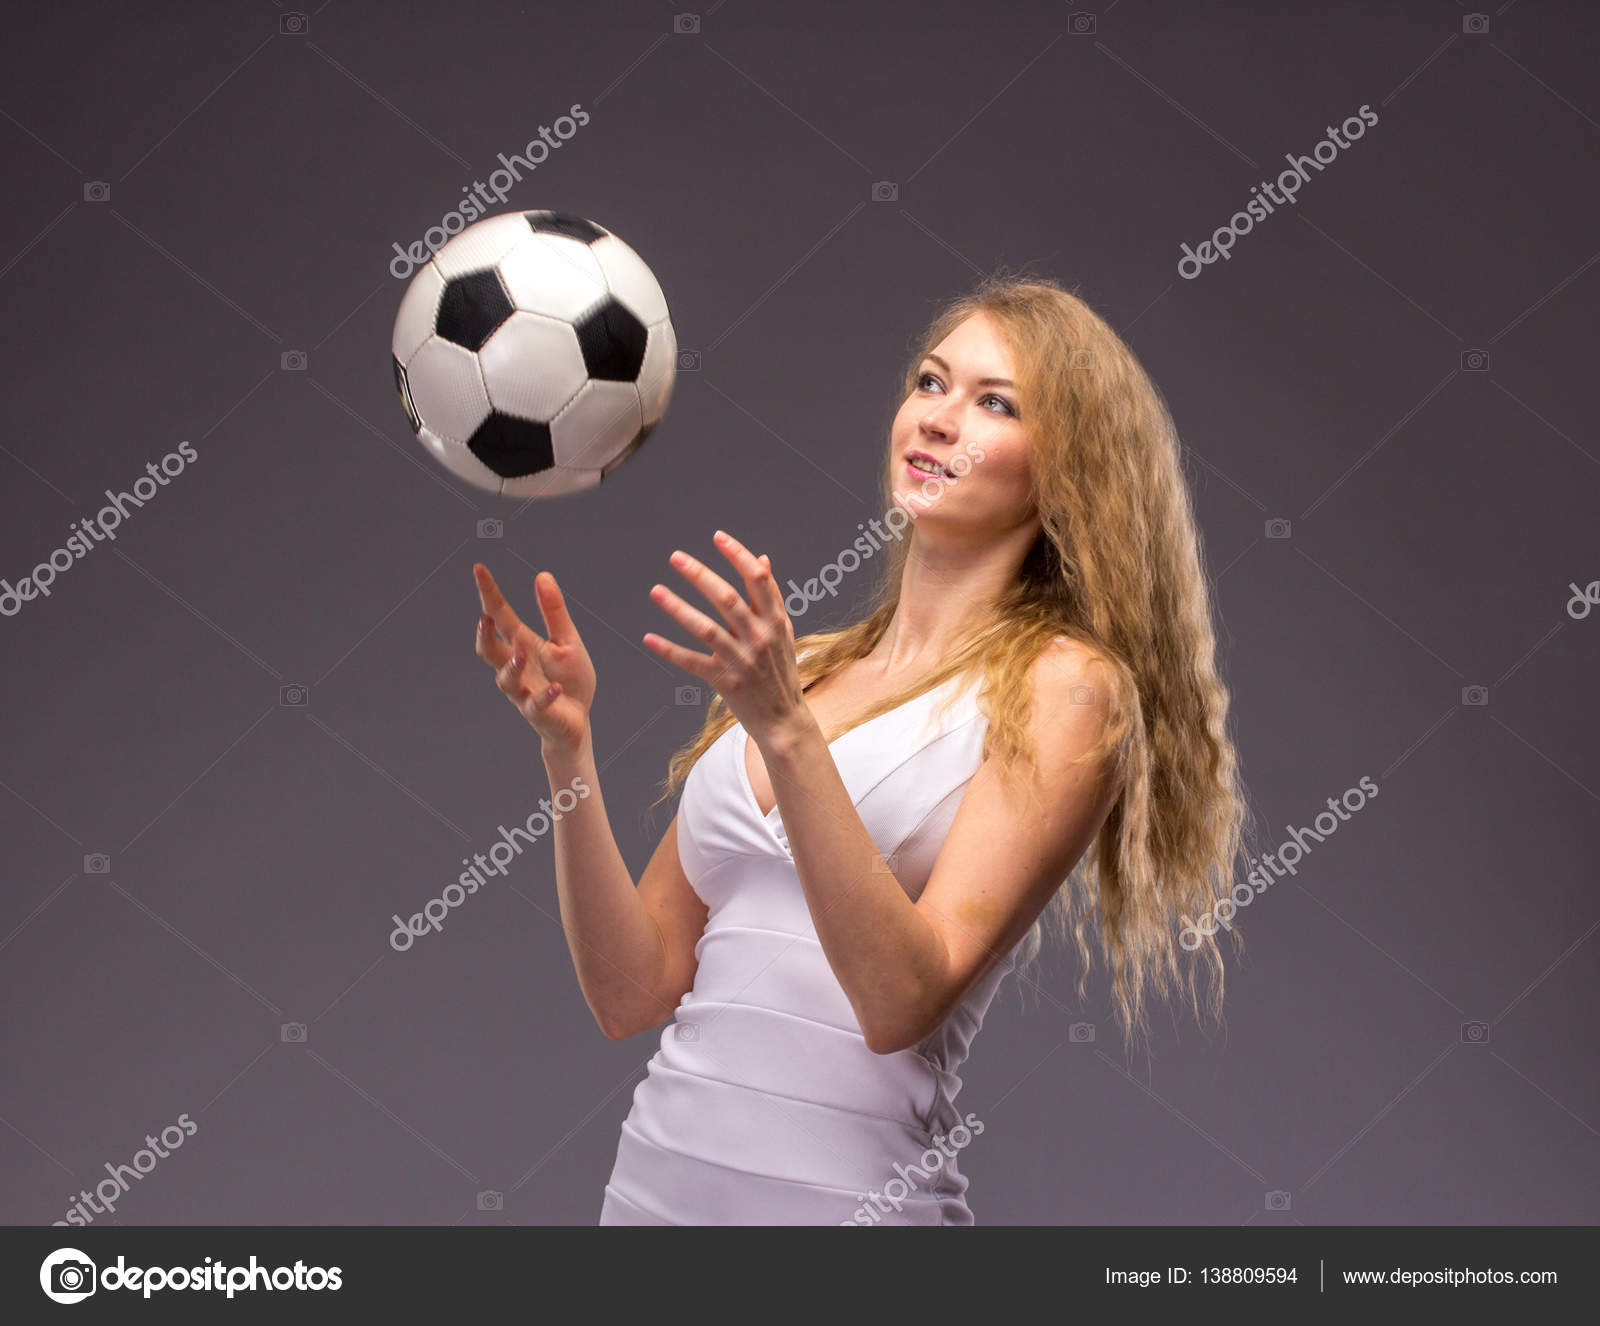 aa3d21cd83ec Νέοι γυναίκα στο λευκό βραδινή τουαλέτα με μπάλα ποδοσφαίρου — Φωτογραφία  Αρχείου